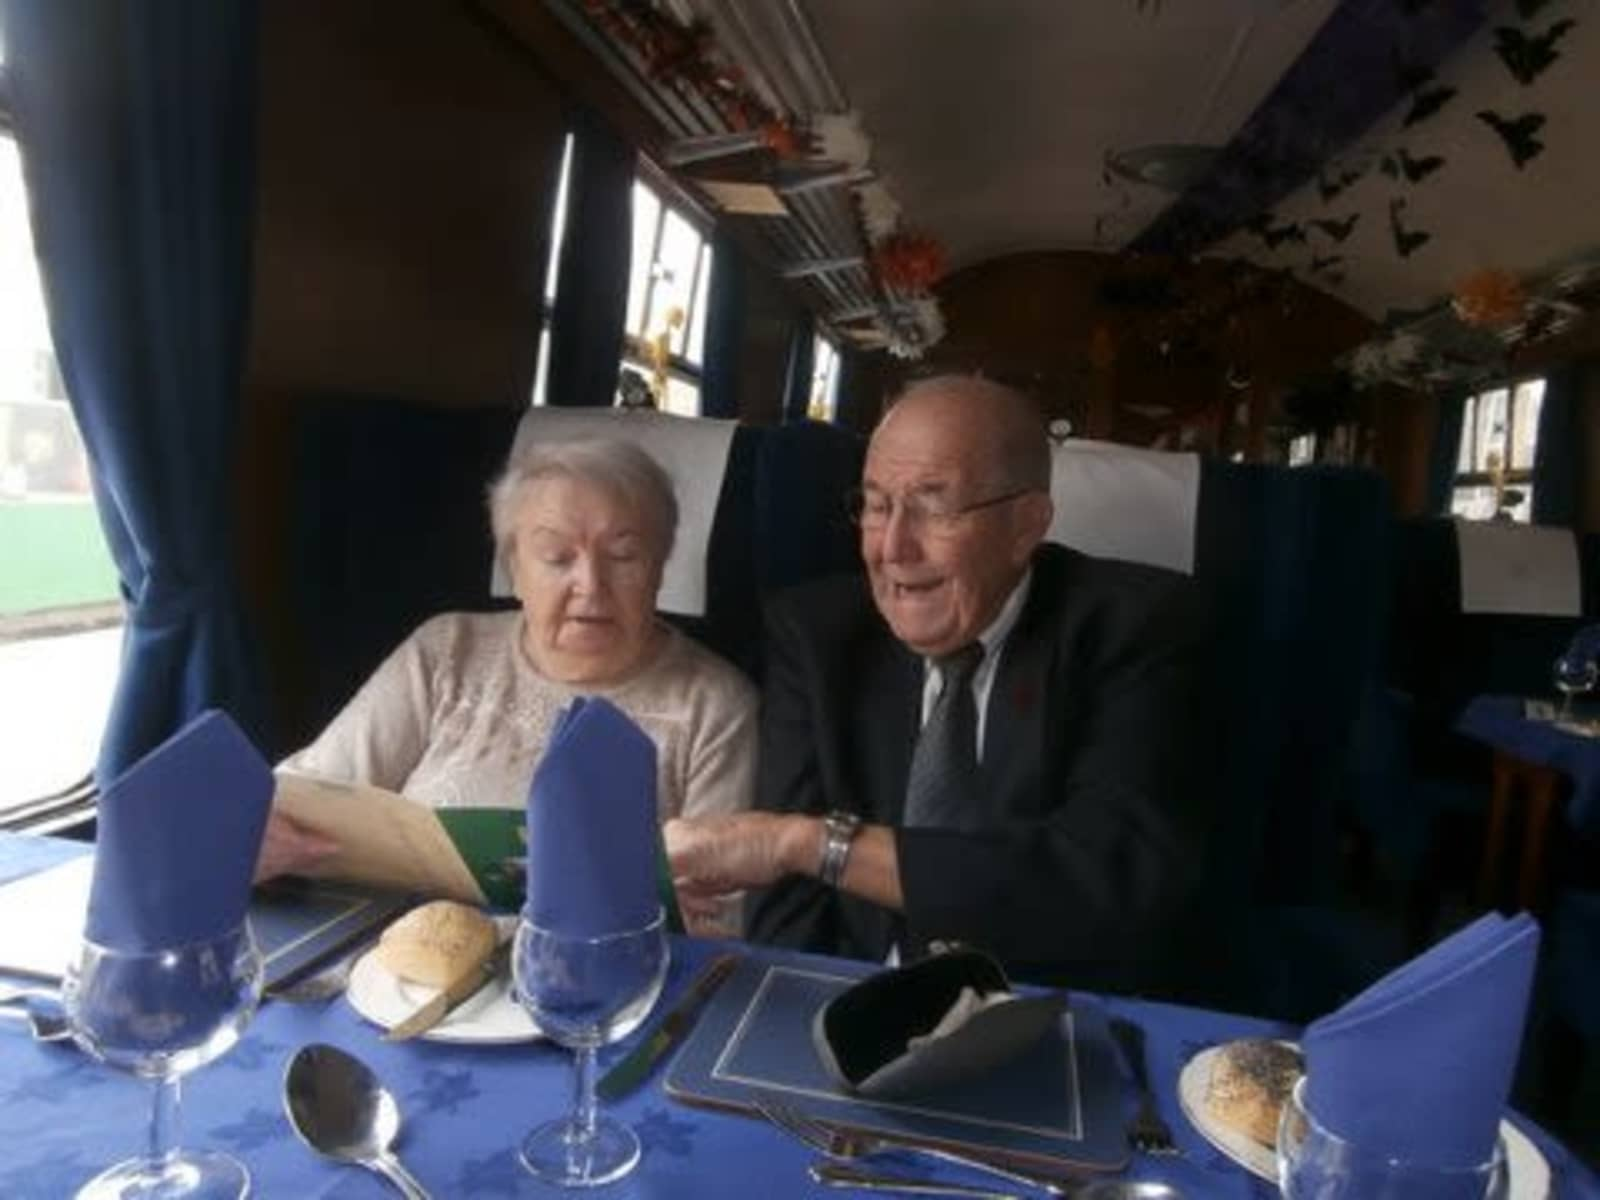 Brian & Brenda from Wimborne Minster, United Kingdom